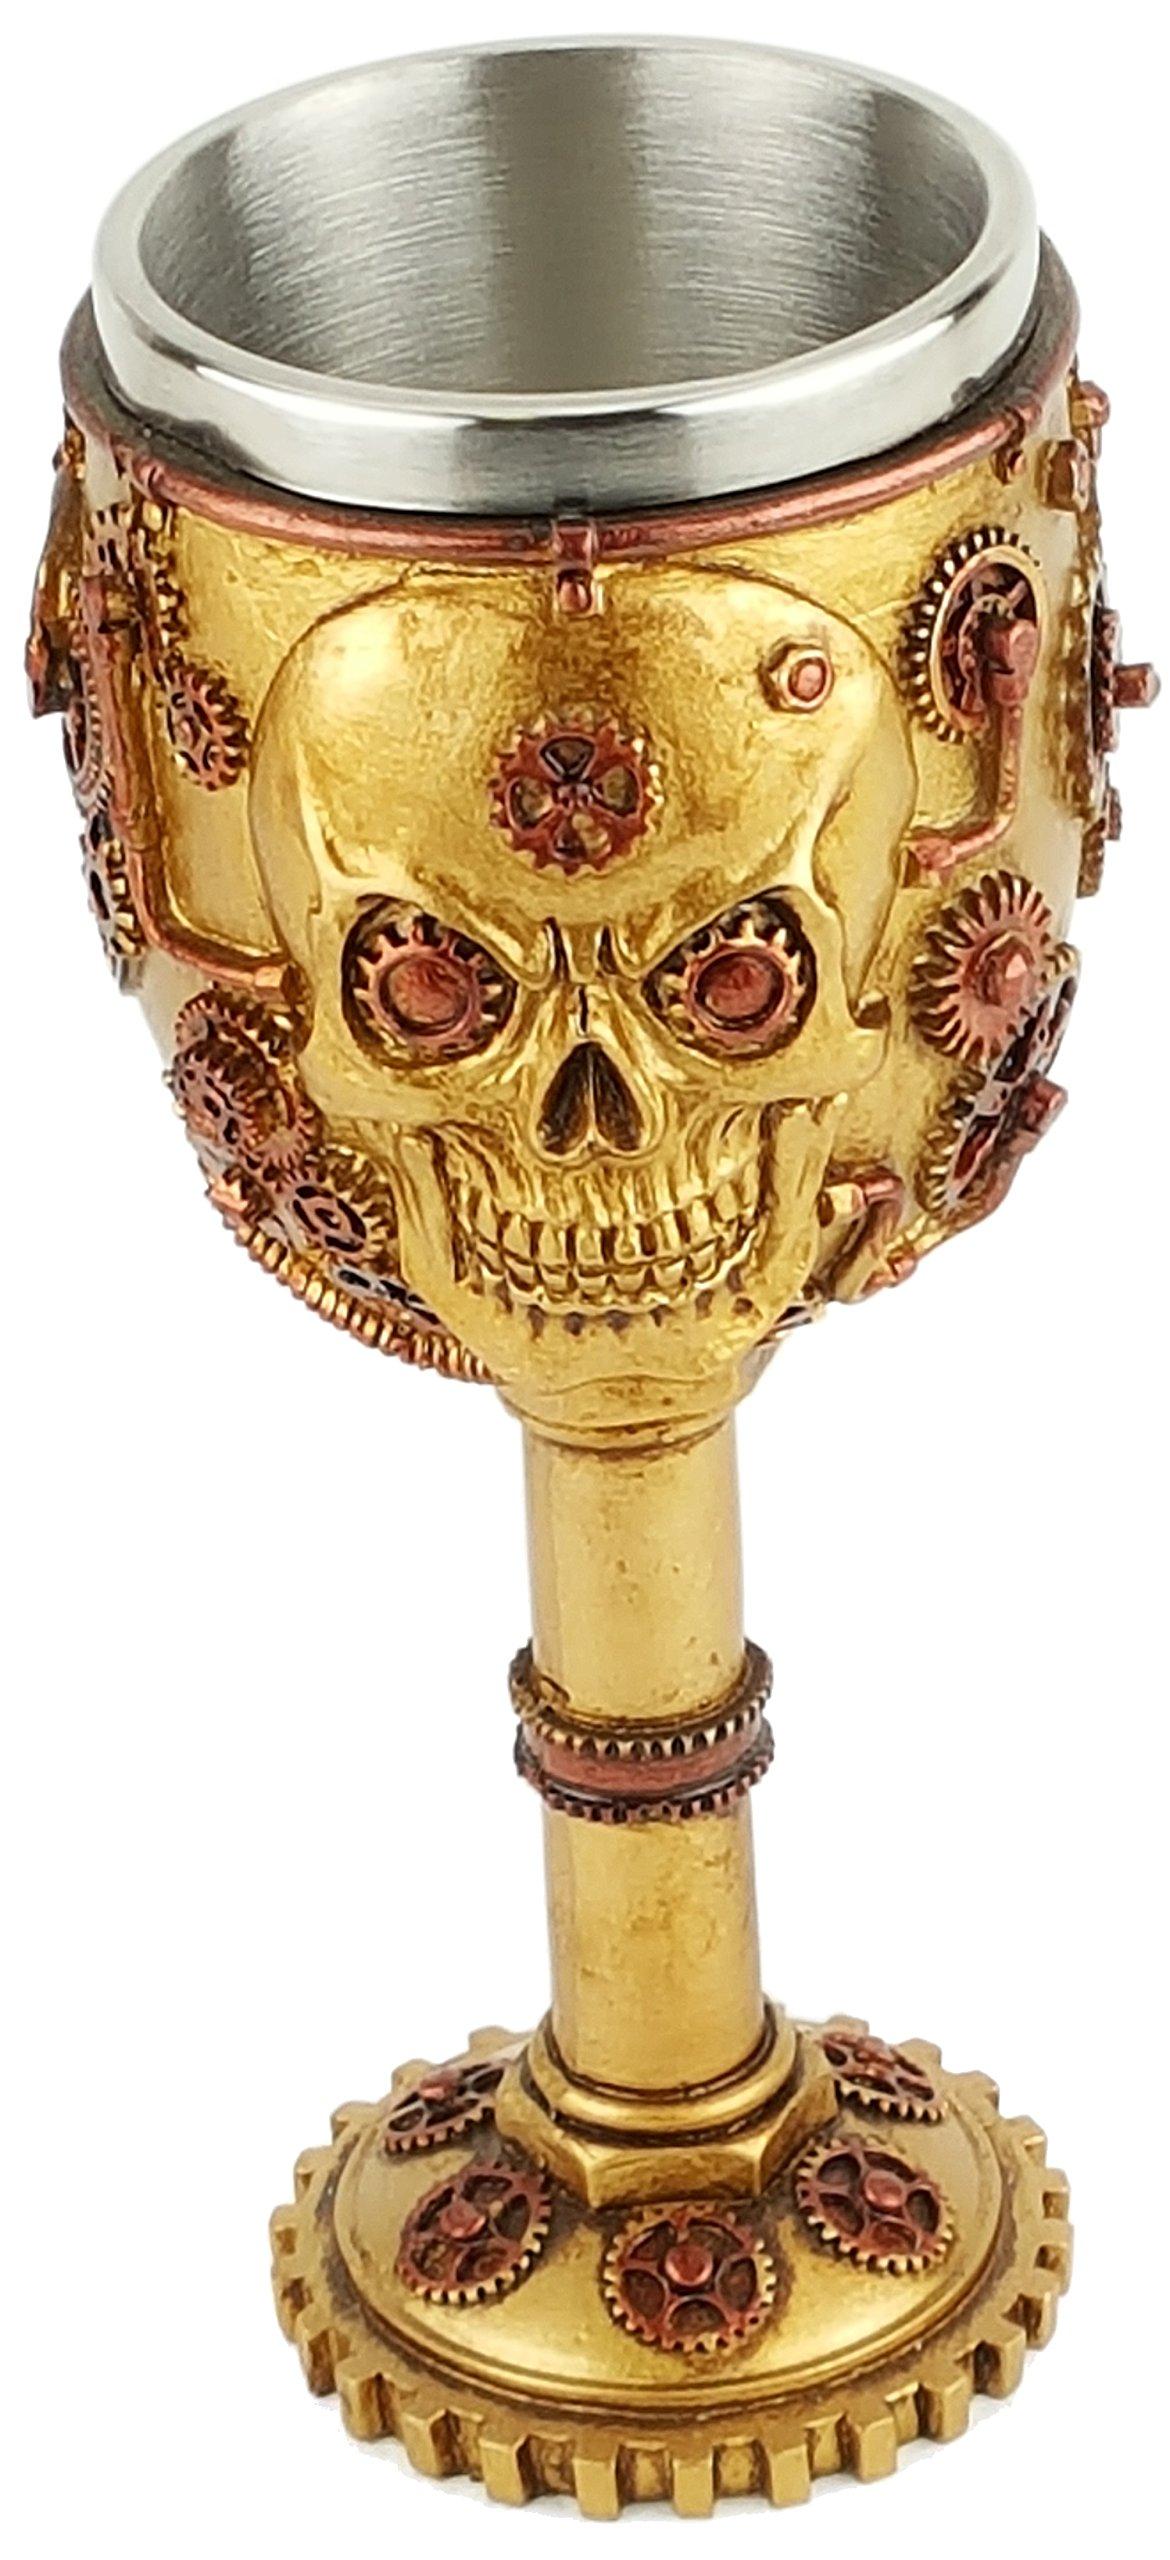 Steampunk Skull, 3D Novelty Chalice/Goblet, Stainless Steel Liner SU59